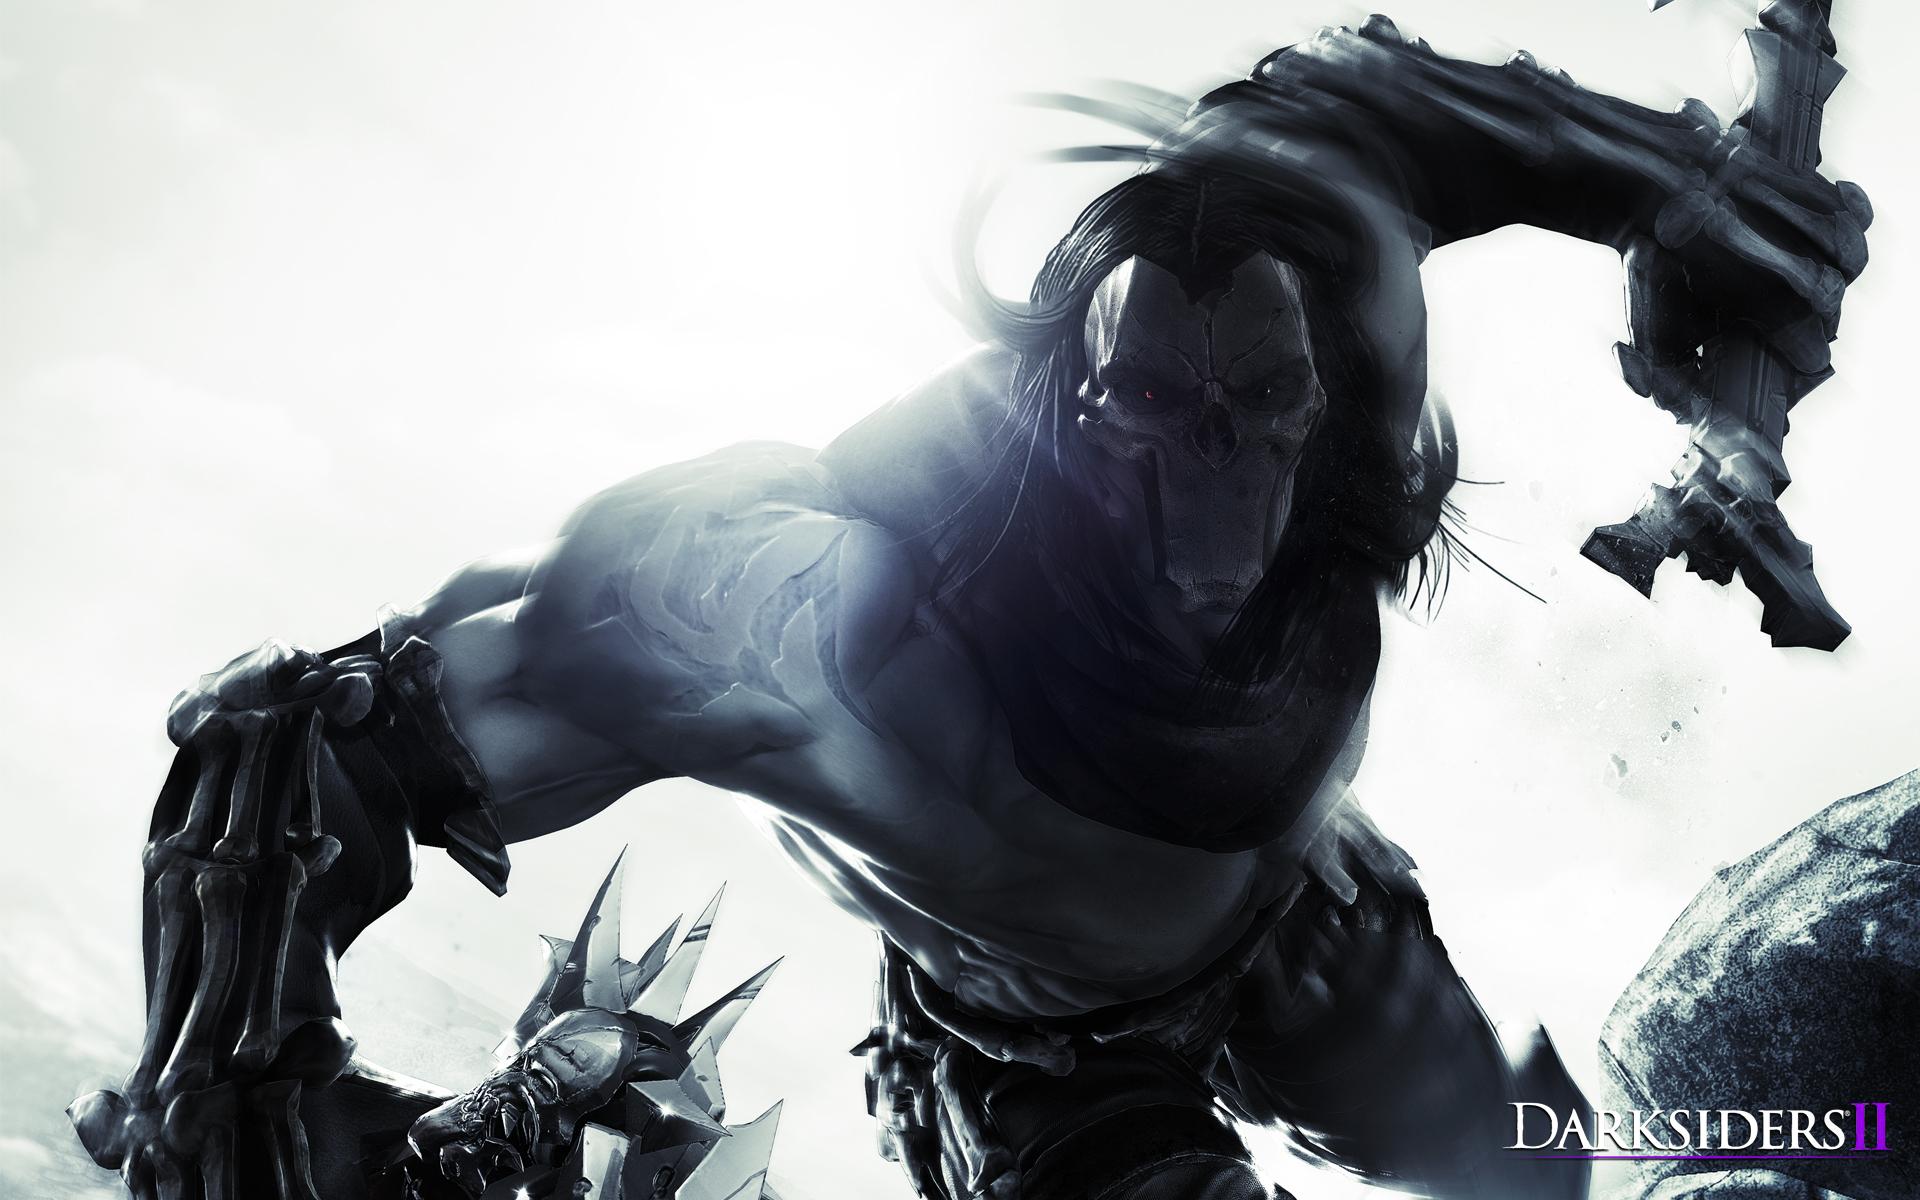 Darksiders II   Death   Wallpaper Full HD   1920x1200   Select Game 1920x1200